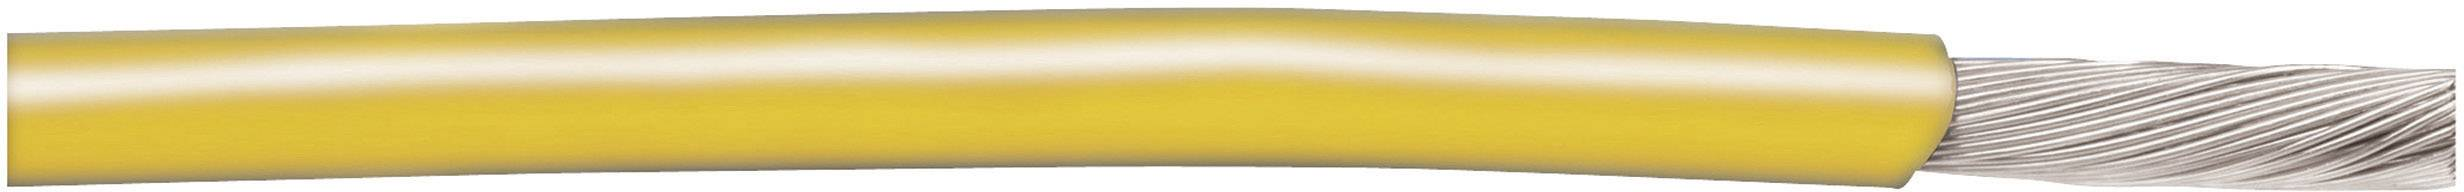 Pletenica 1 x 0.82 mm, rumena AlphaWire 3055 YL001 cena za meter